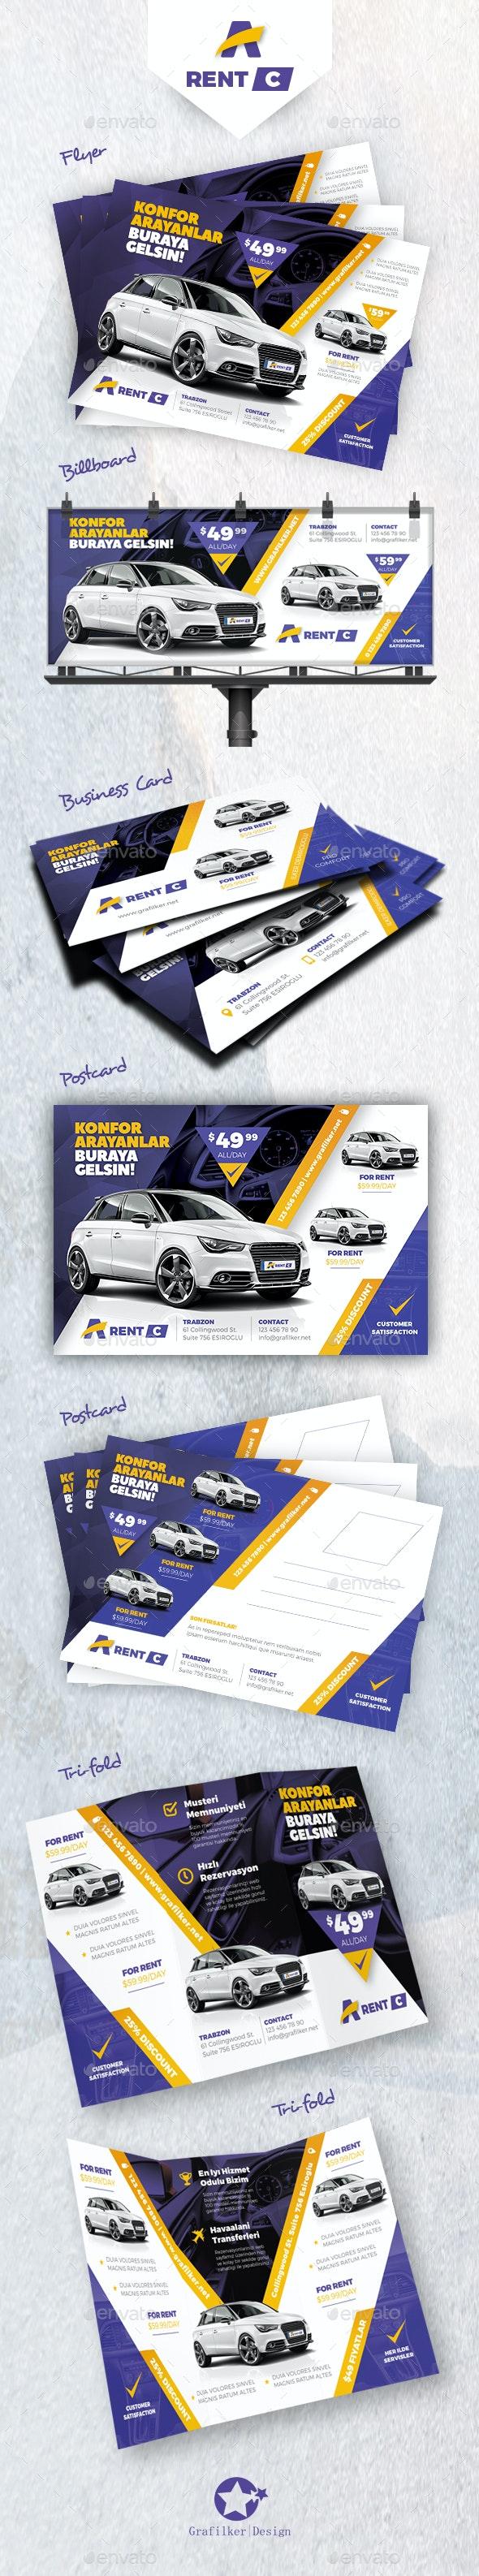 Ren A Car Bundle Templates - Corporate Flyers